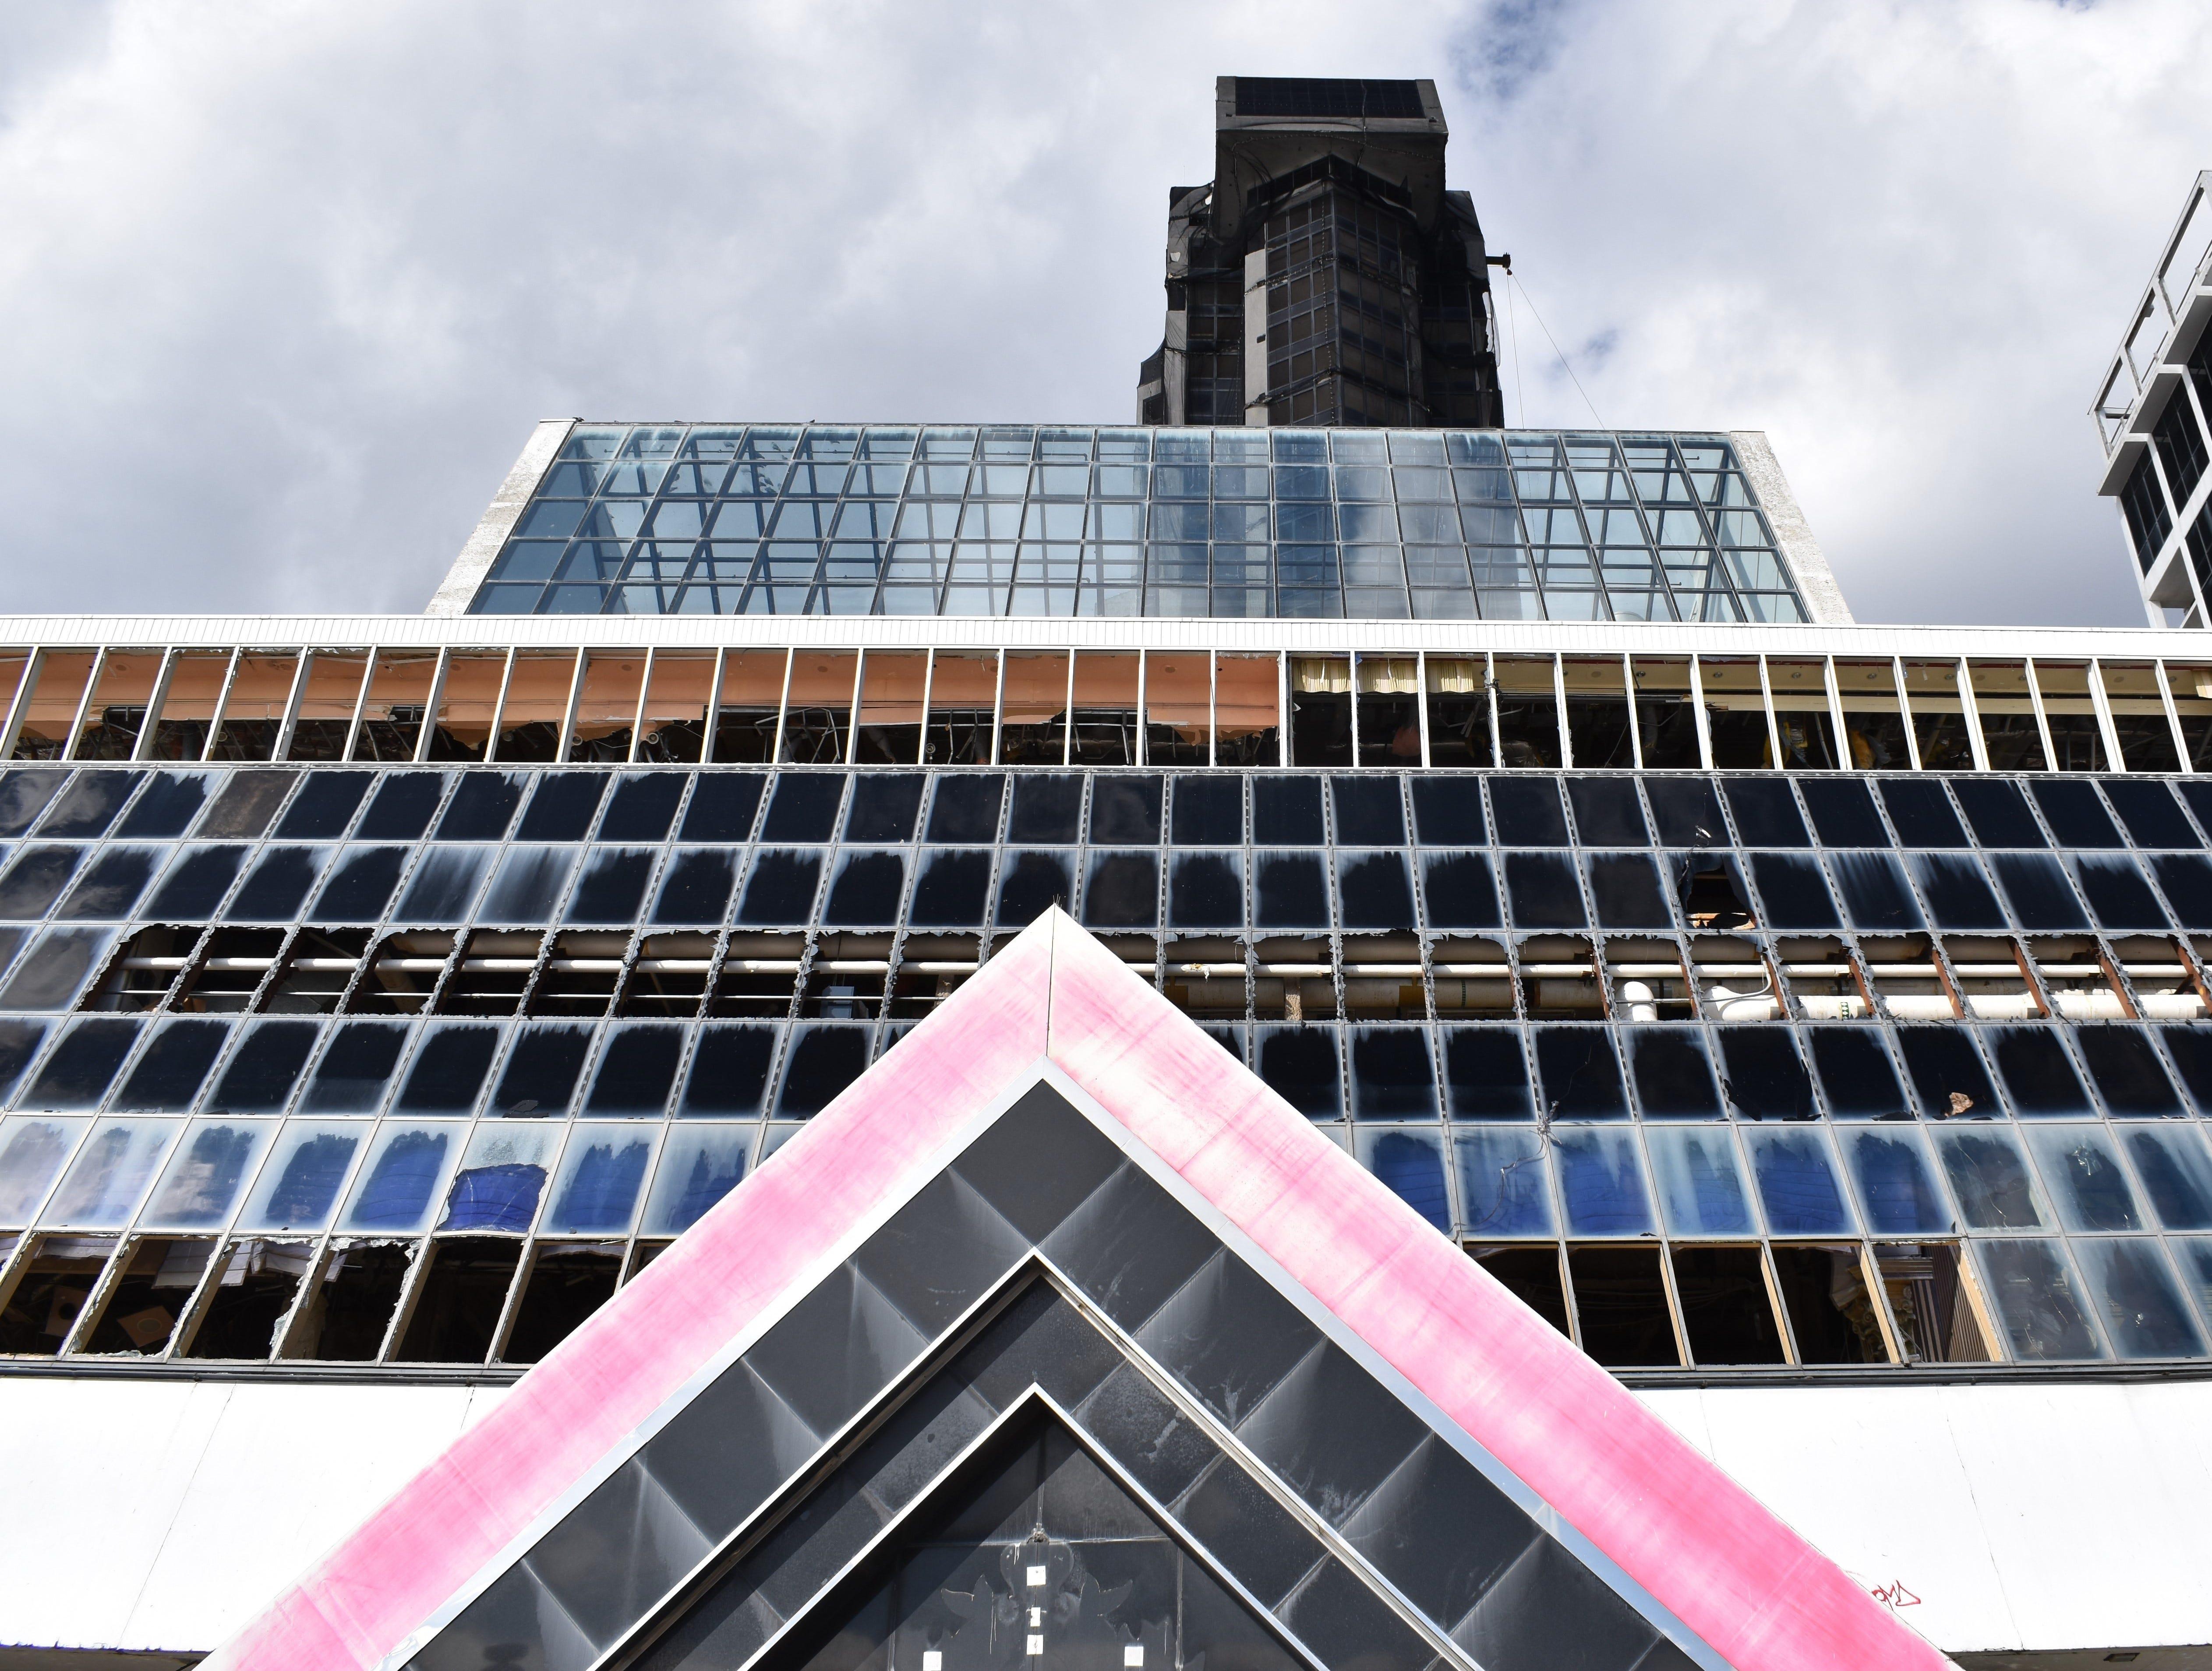 The former Trump Plaza casino-hotel in Atlantic City is awaiting demolition.